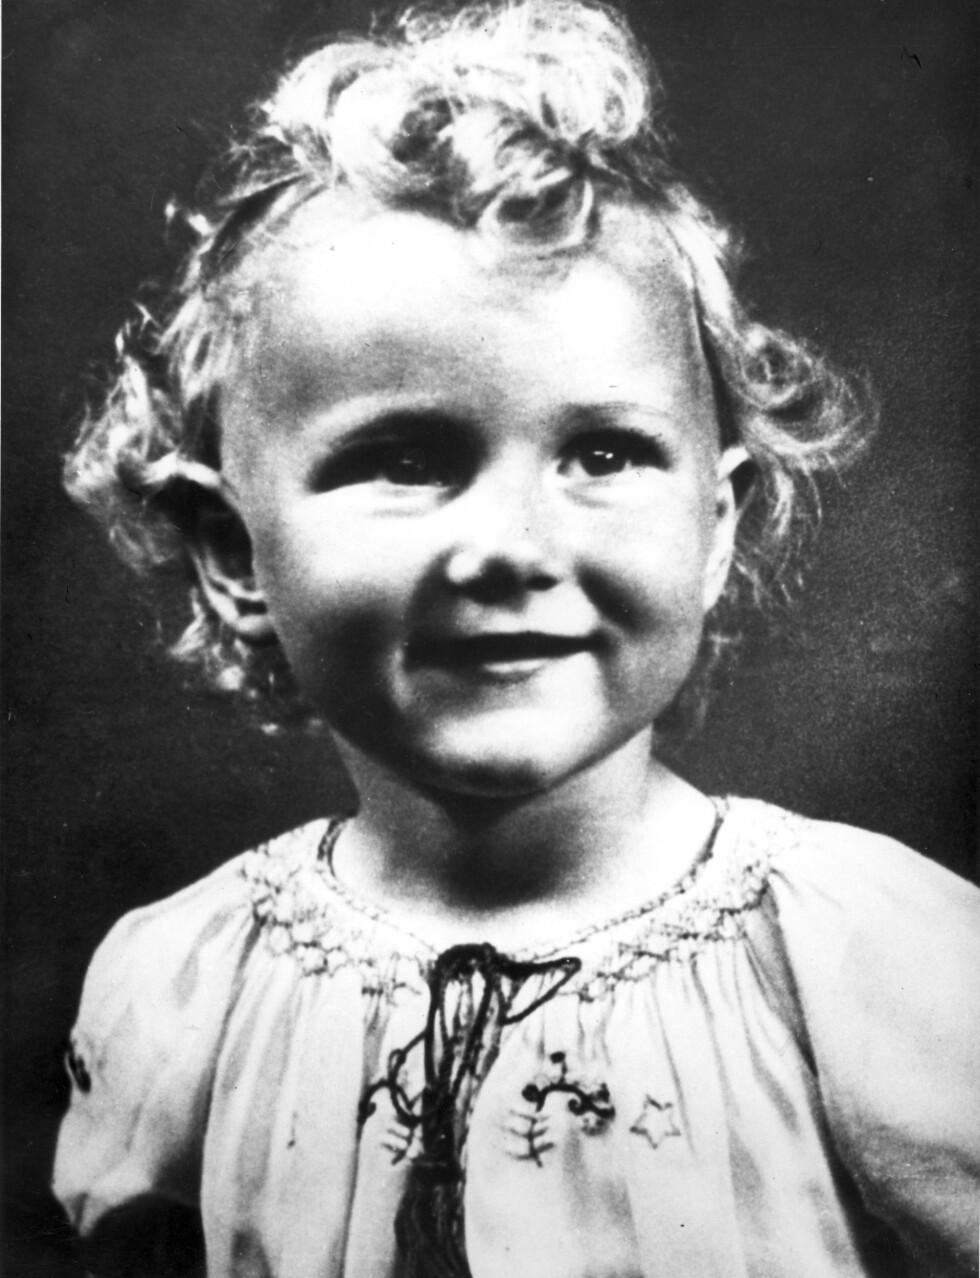 4 ÅR: Lille Sonja Haraldsen fotografert i 1941.  Foto:  Foto: NTB Scanpix